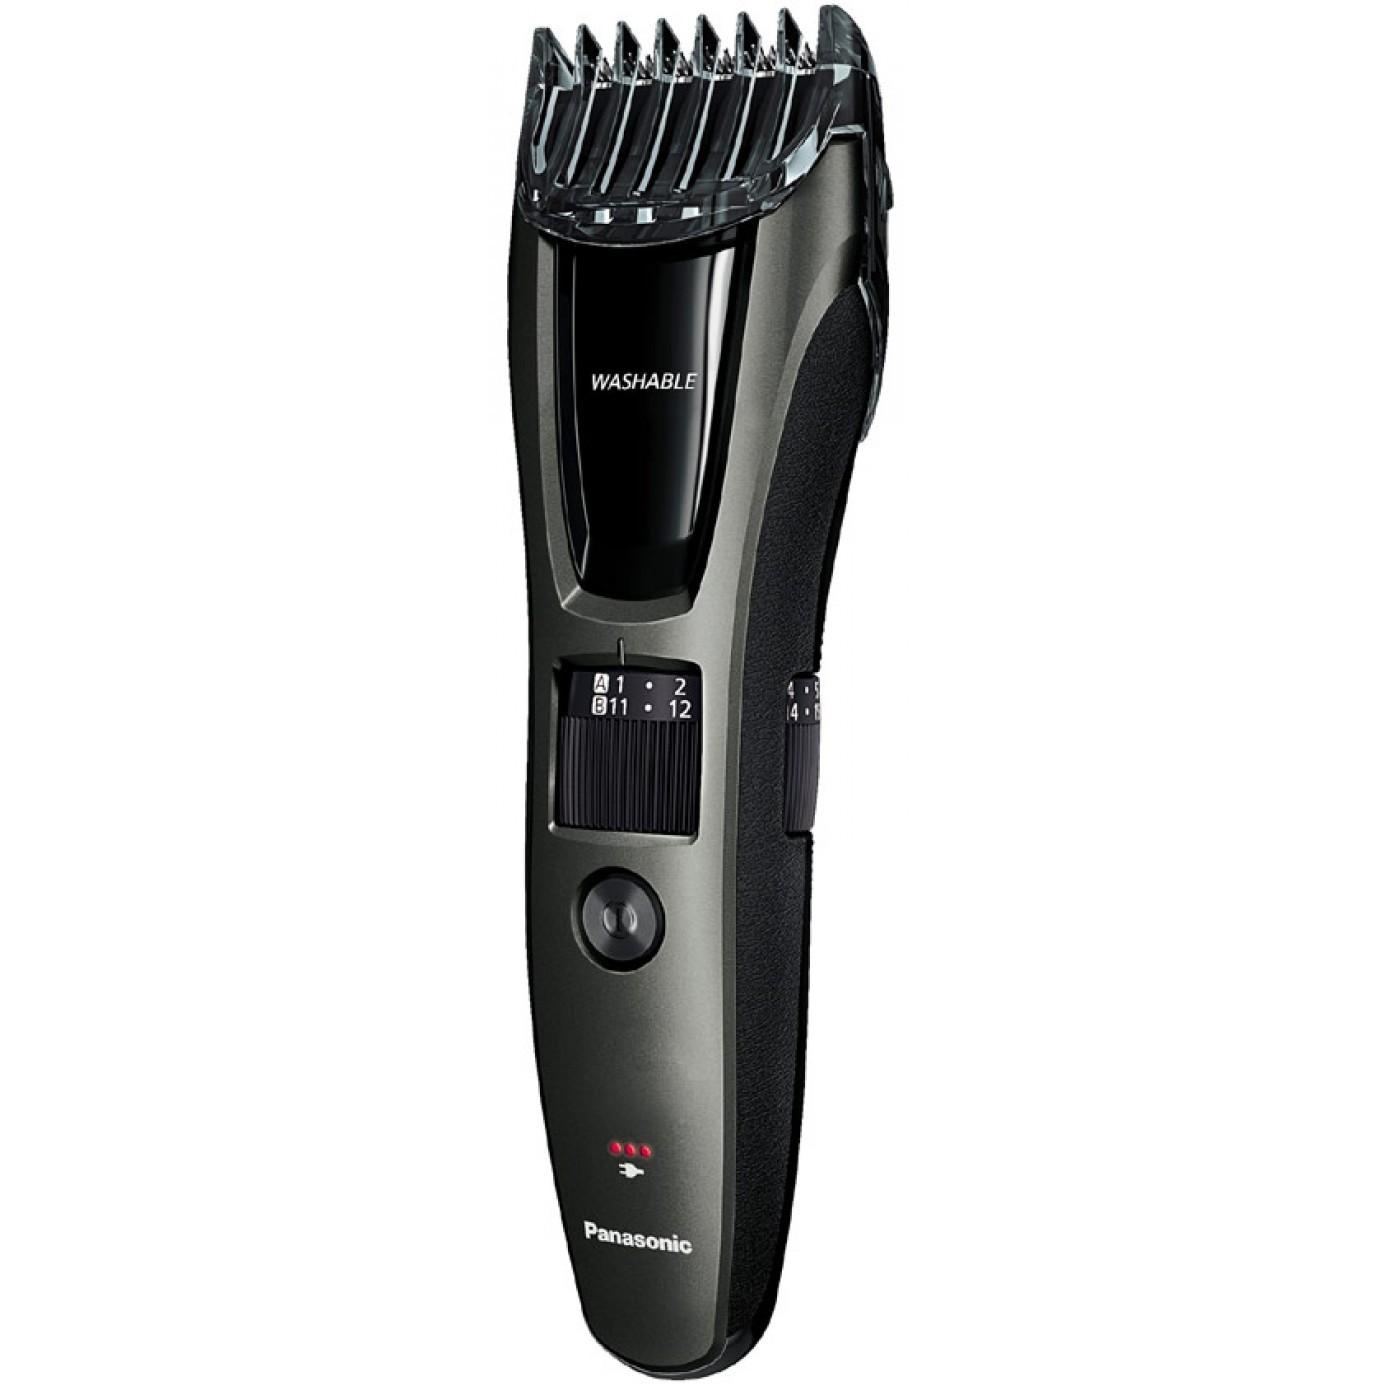 PANASONIC ER-GB 60 Hair and Beard Trimmer